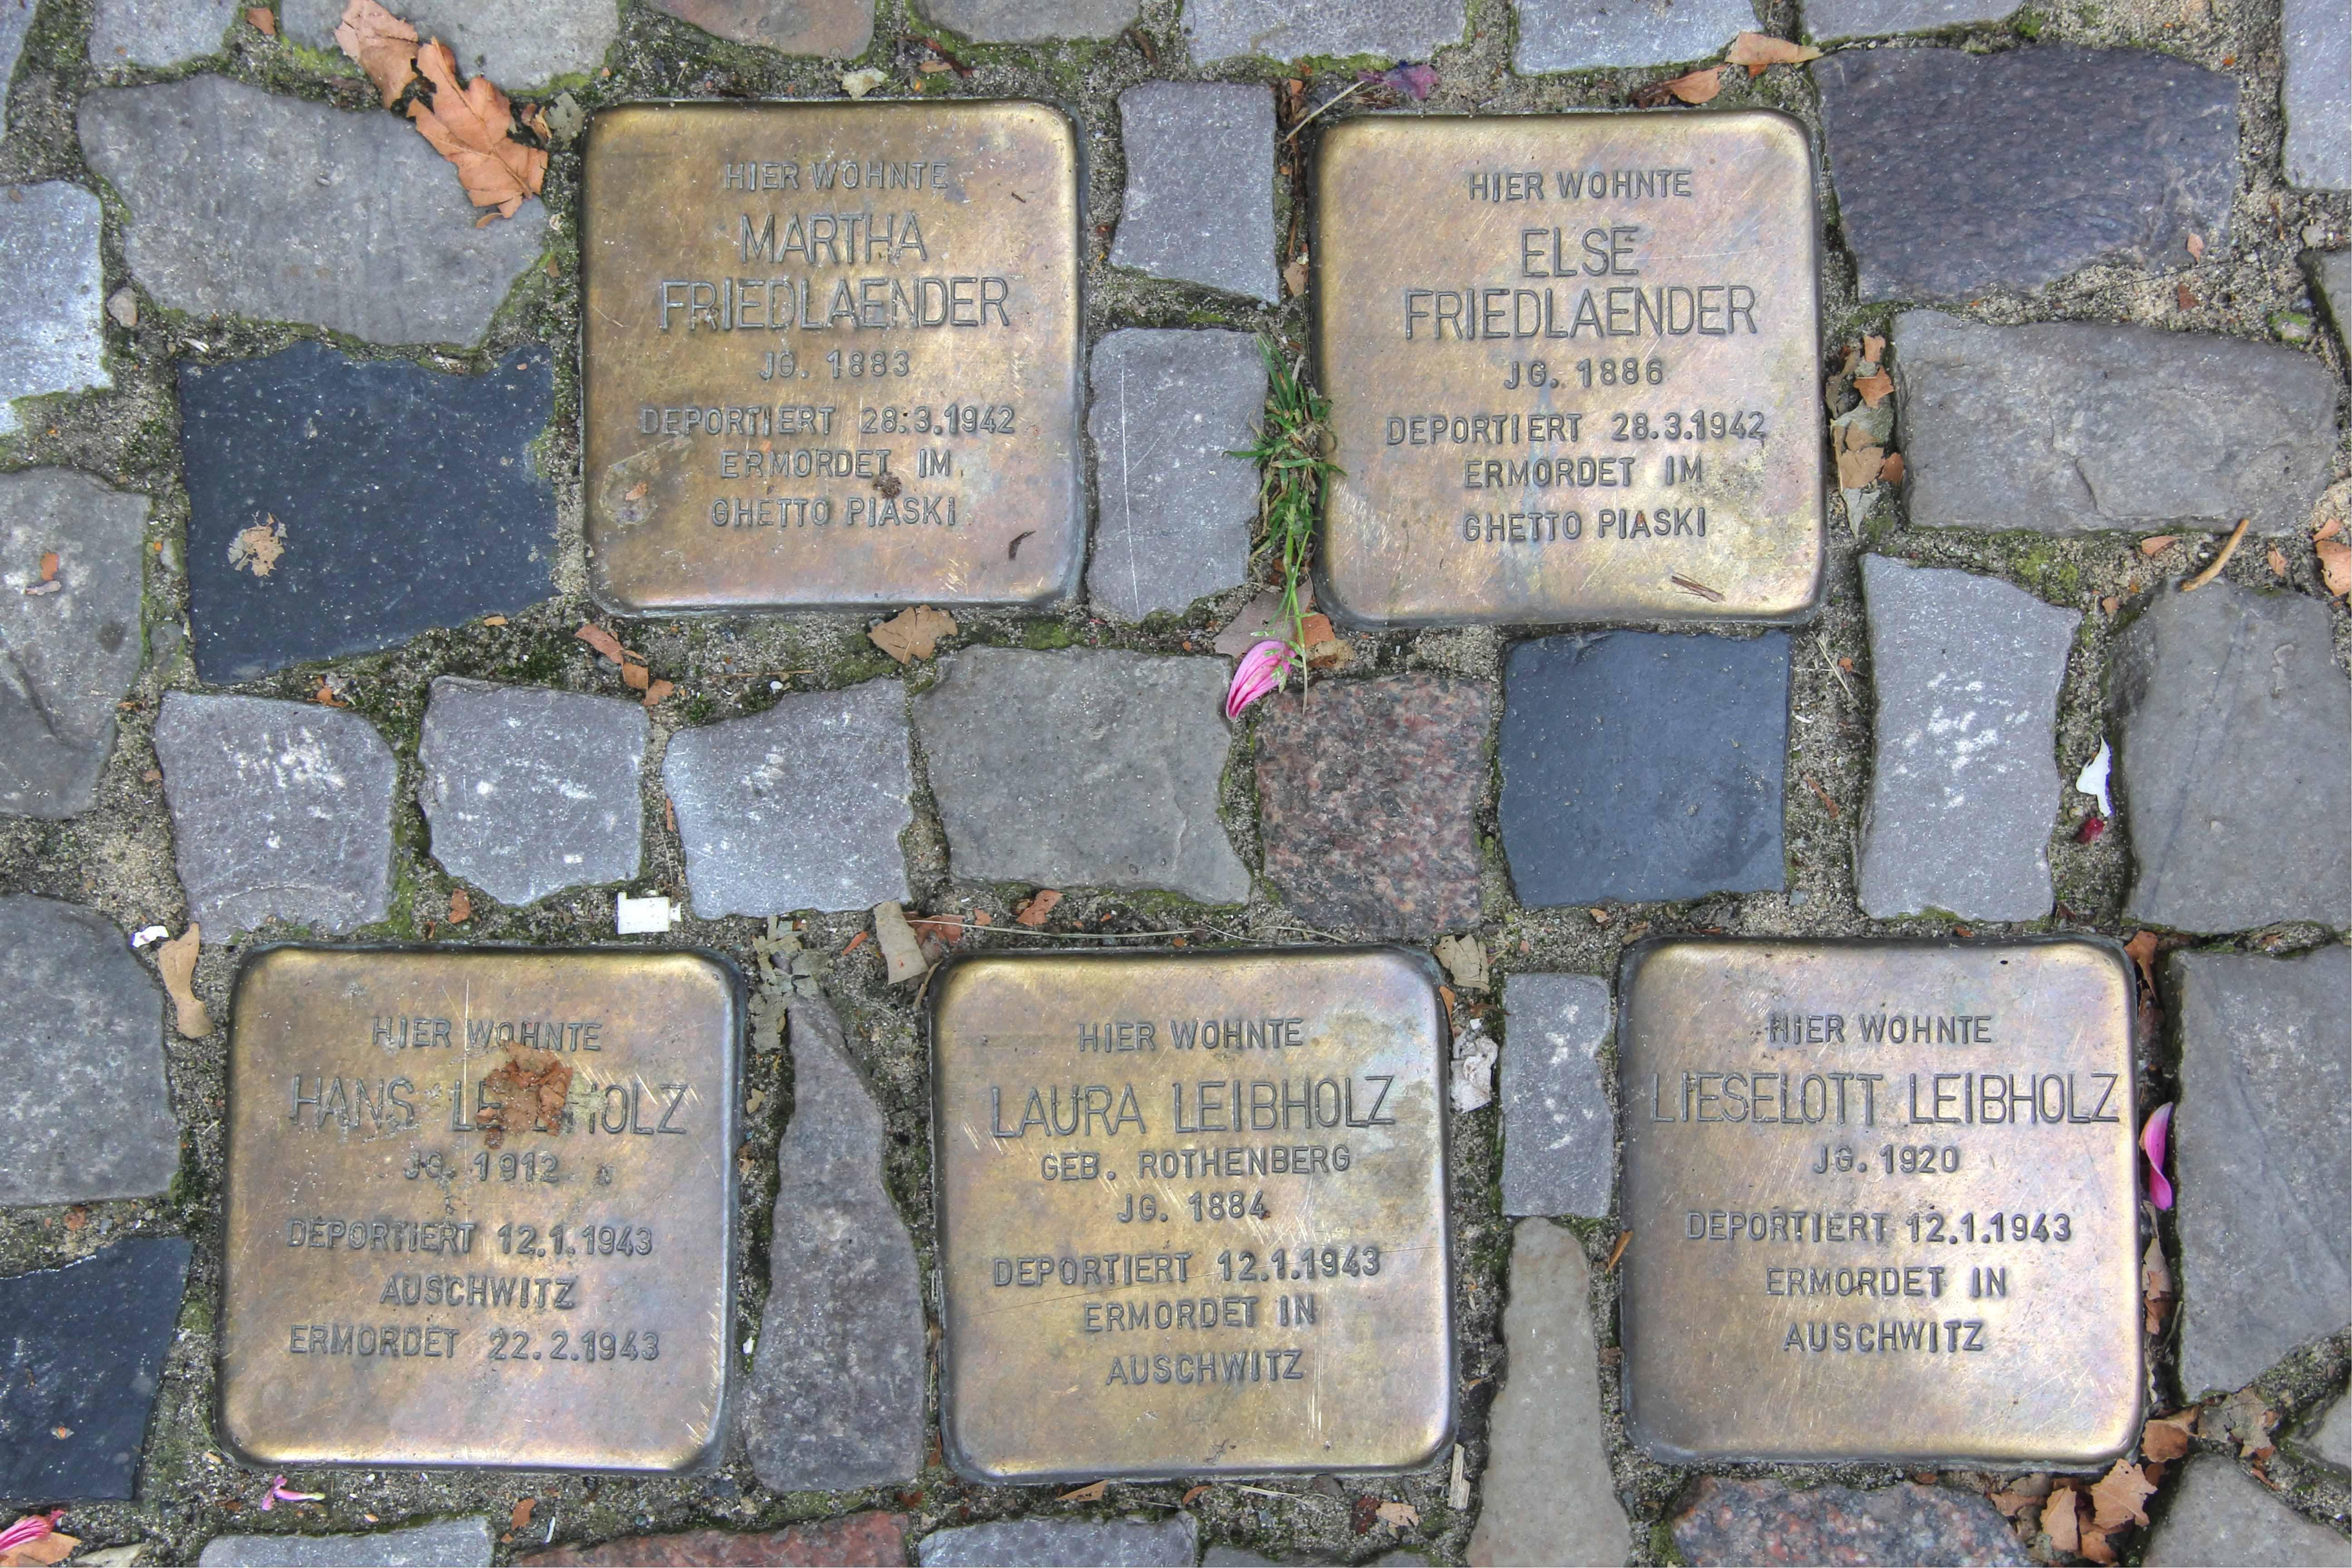 Stolpersteine 125: In memory of Martha Friedlaender, Else Friedlaender, Hans Leibholz, Laura Leibholz and Lieselott Leibholz (Danckelmannstrasse 44) in Berlin